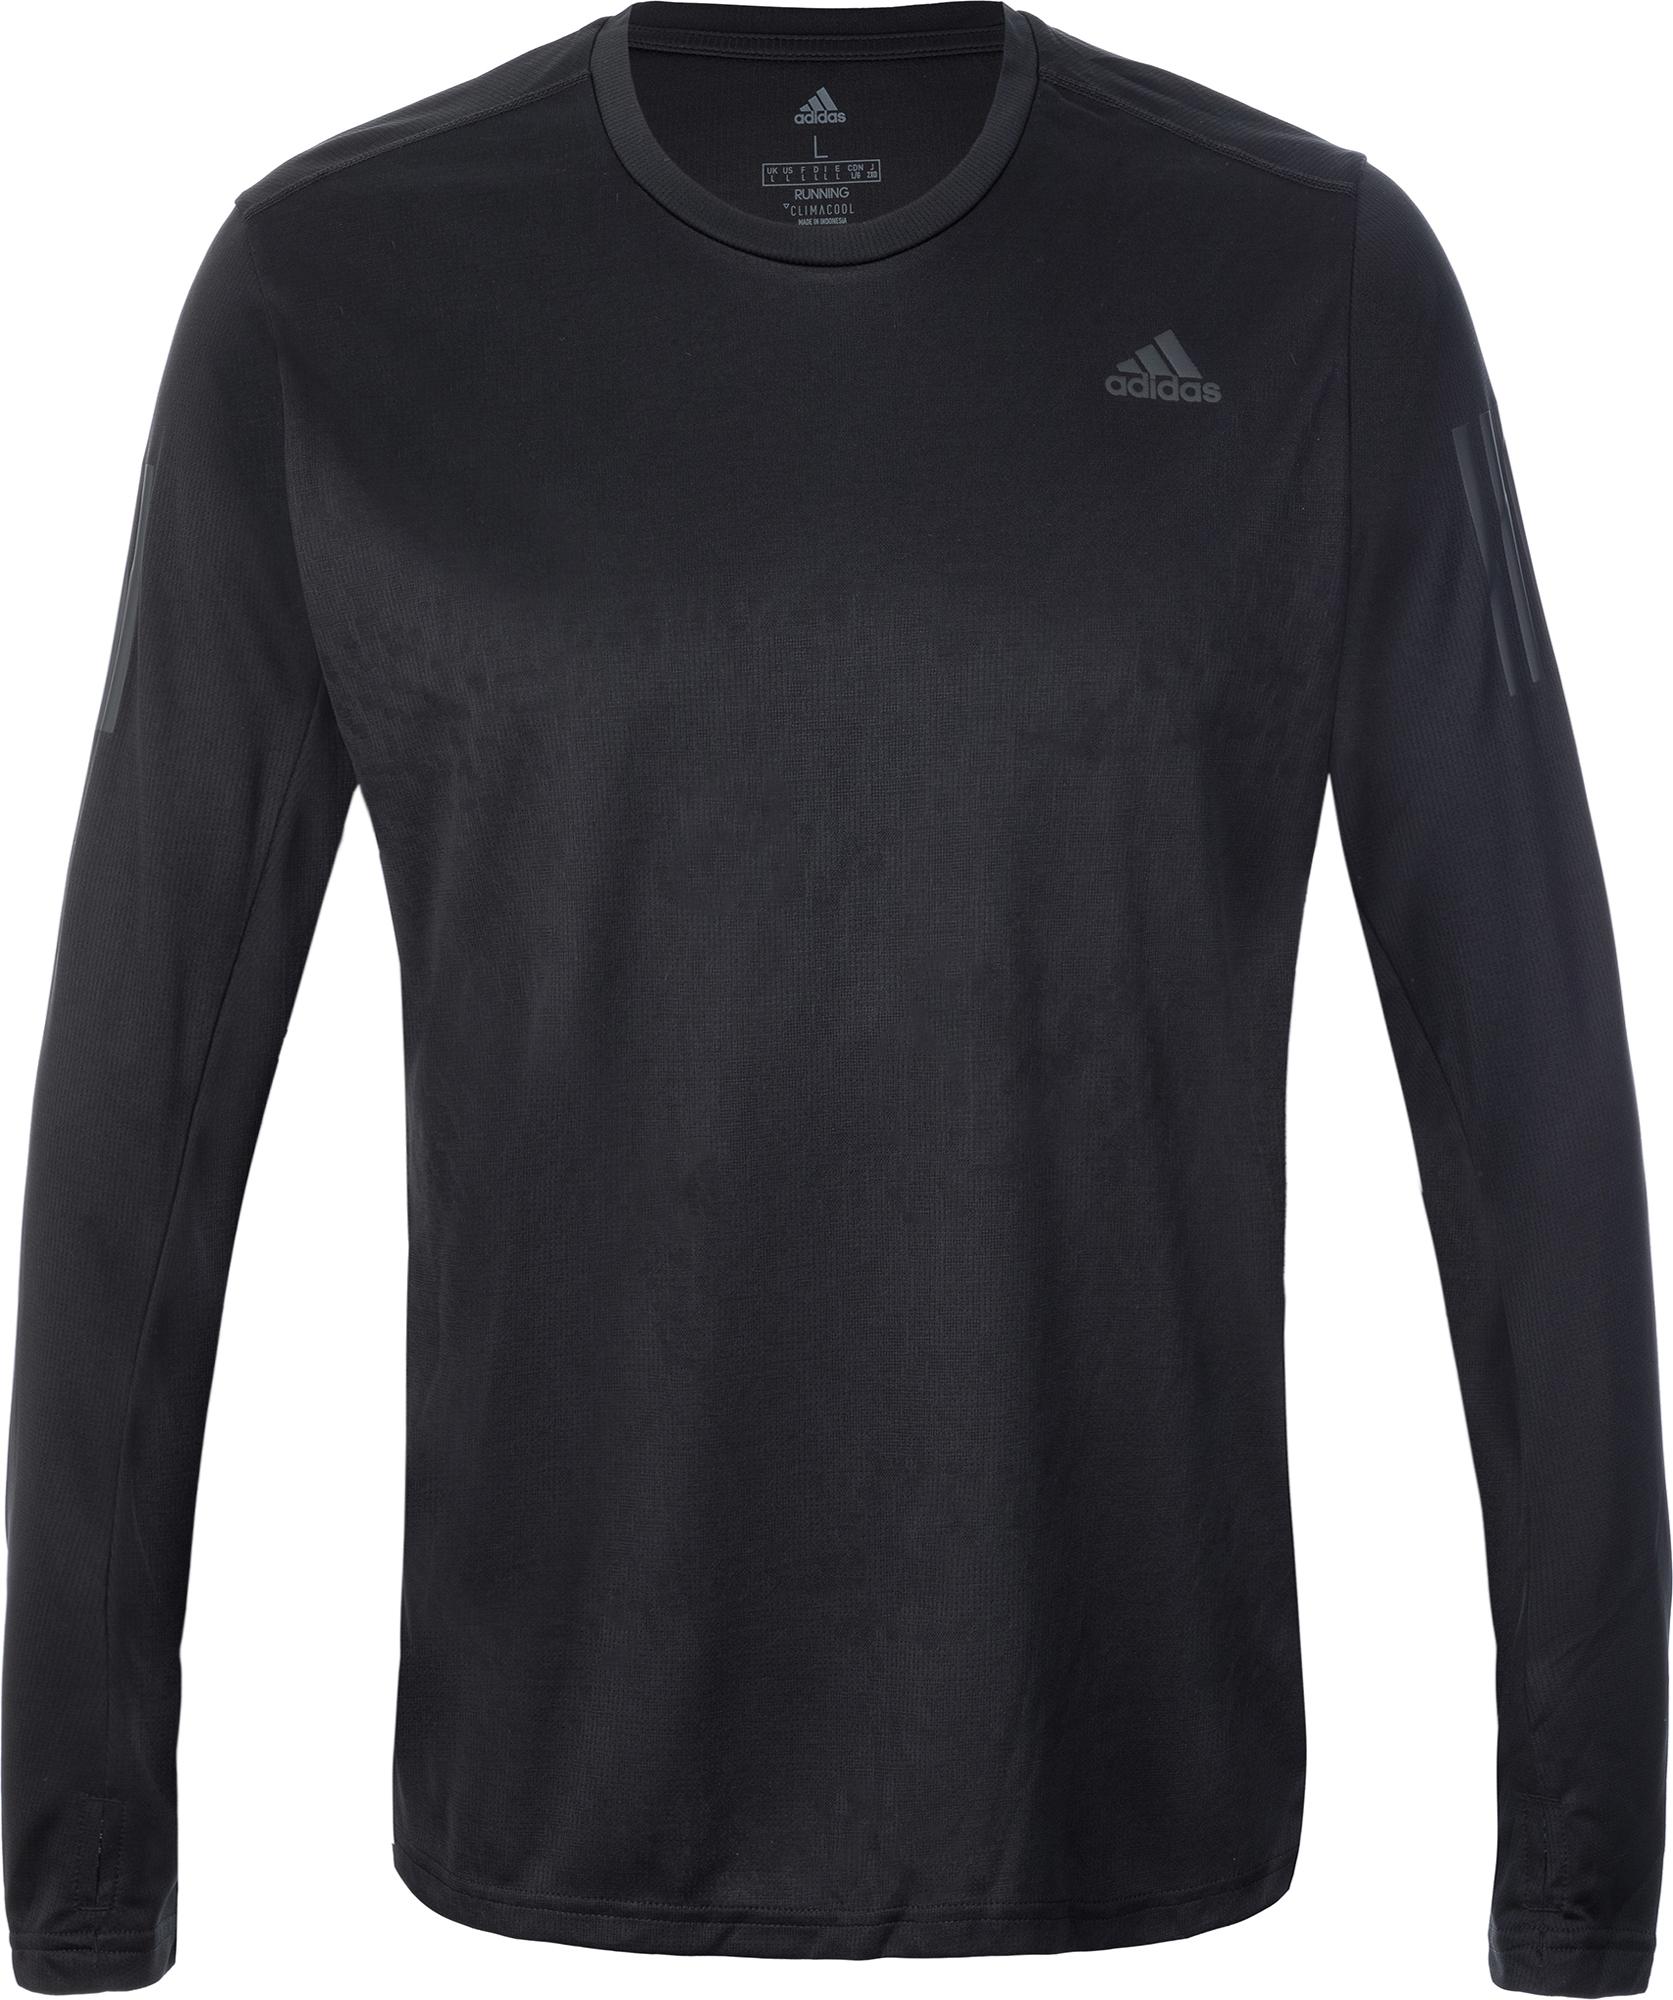 Adidas Лонгслив мужской Adidas Own the Run, размер 58 цены